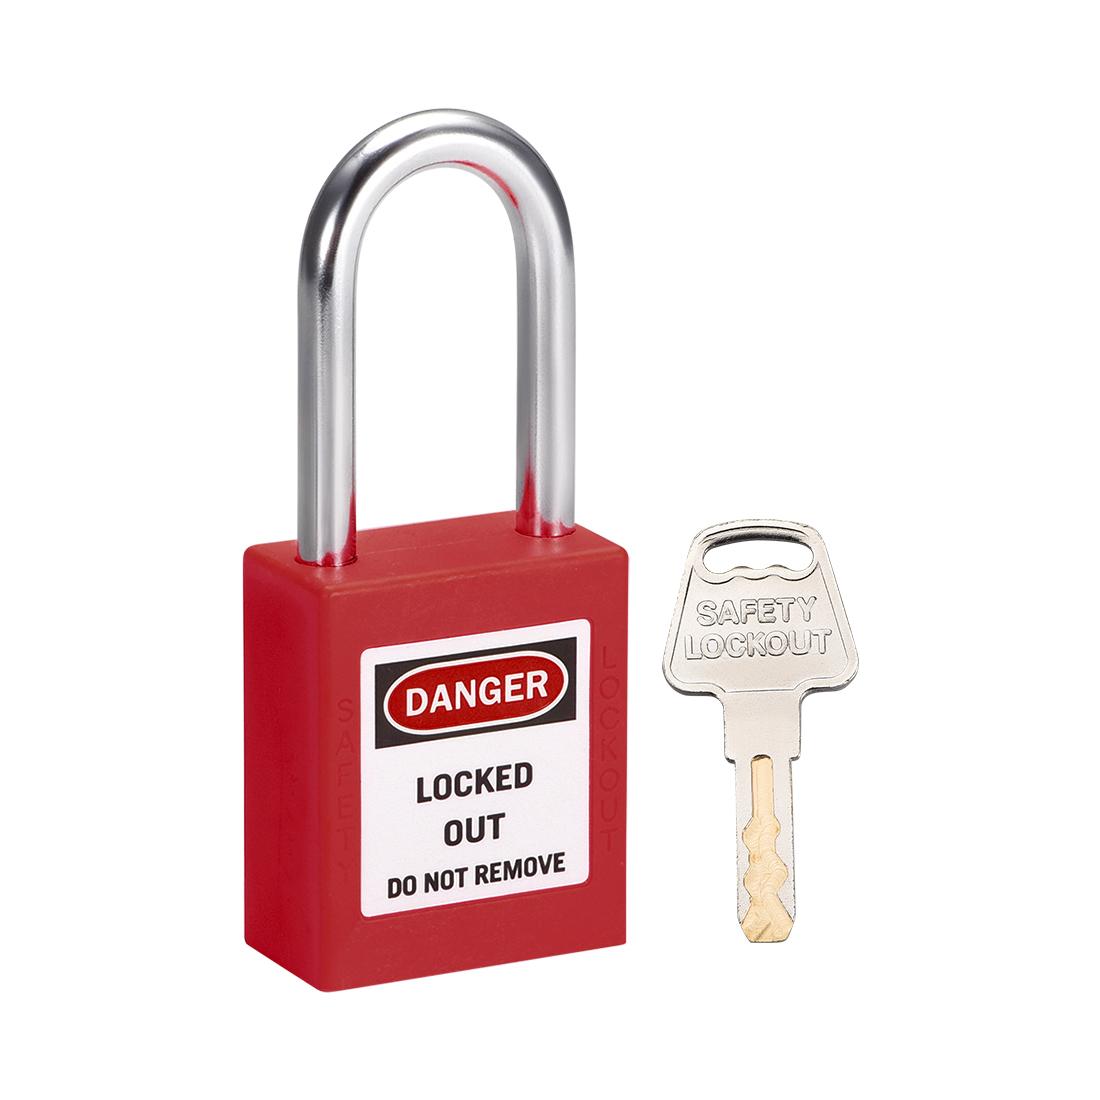 Lockout Tagout Locks 1-1/2 Inch Shackle Key Alike Safety Padlock Plastic Red